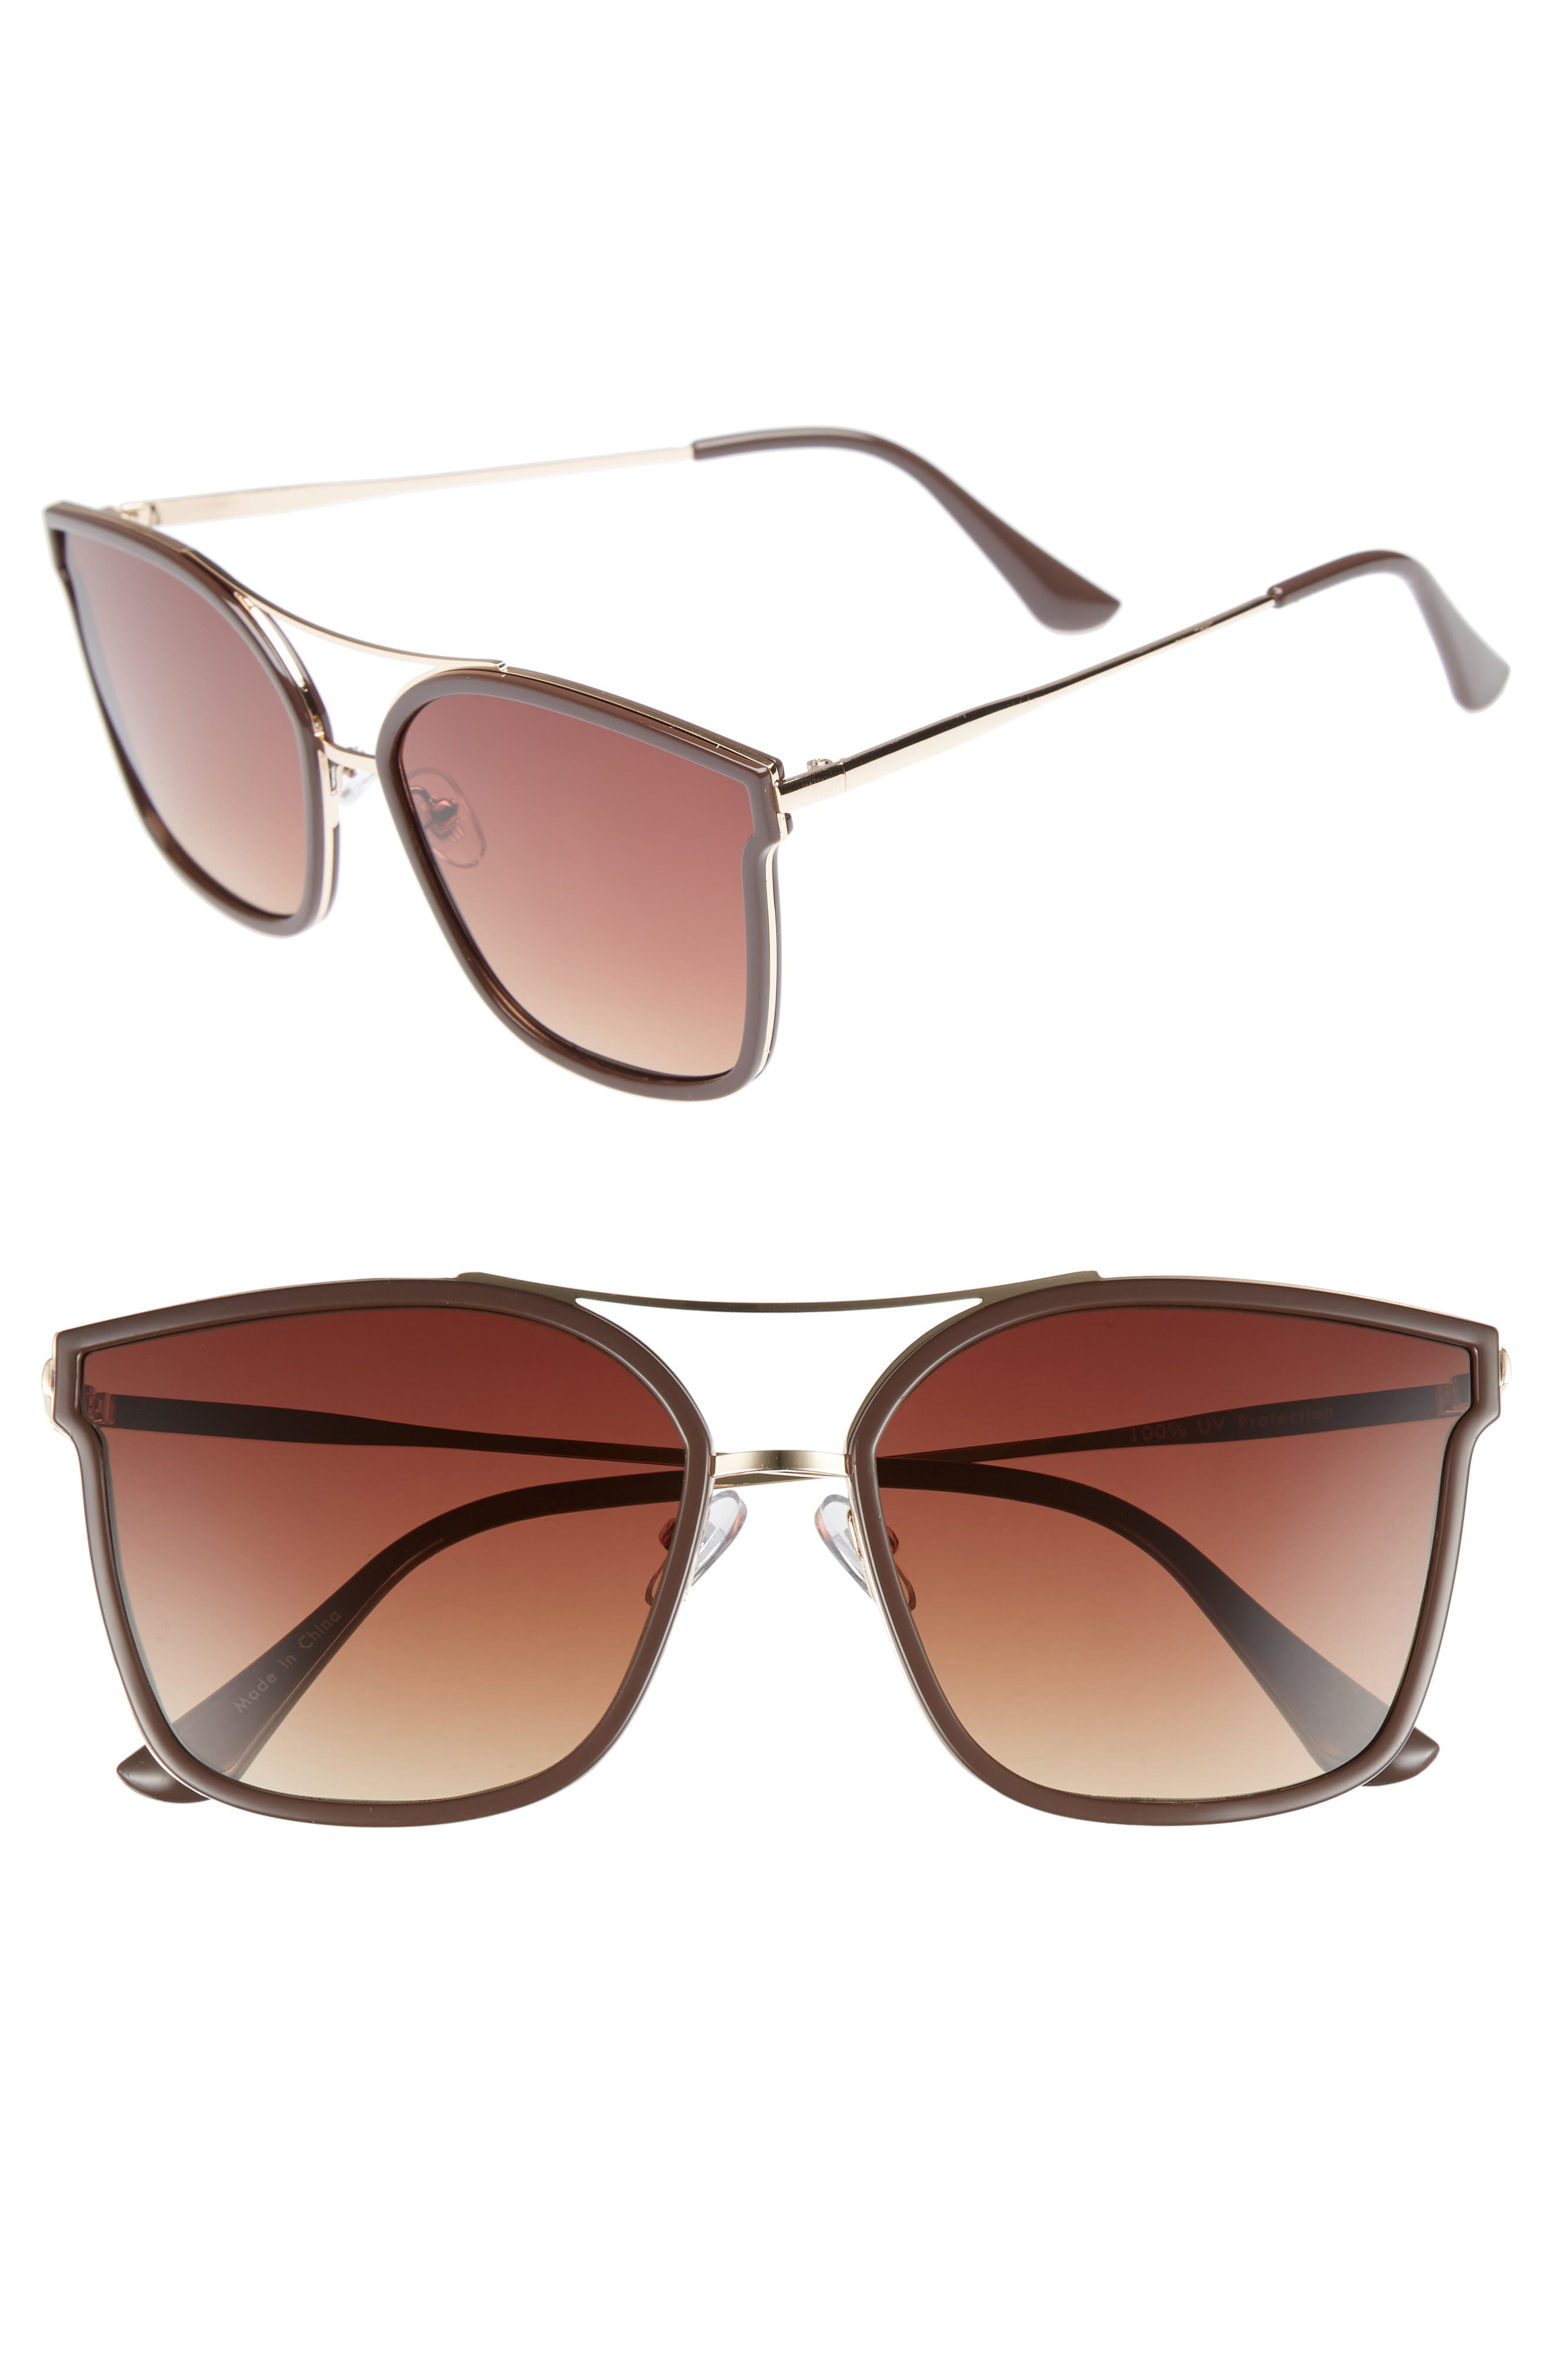 60mm Cat Eye Sunglasses,                             Main thumbnail 1, color,                             710